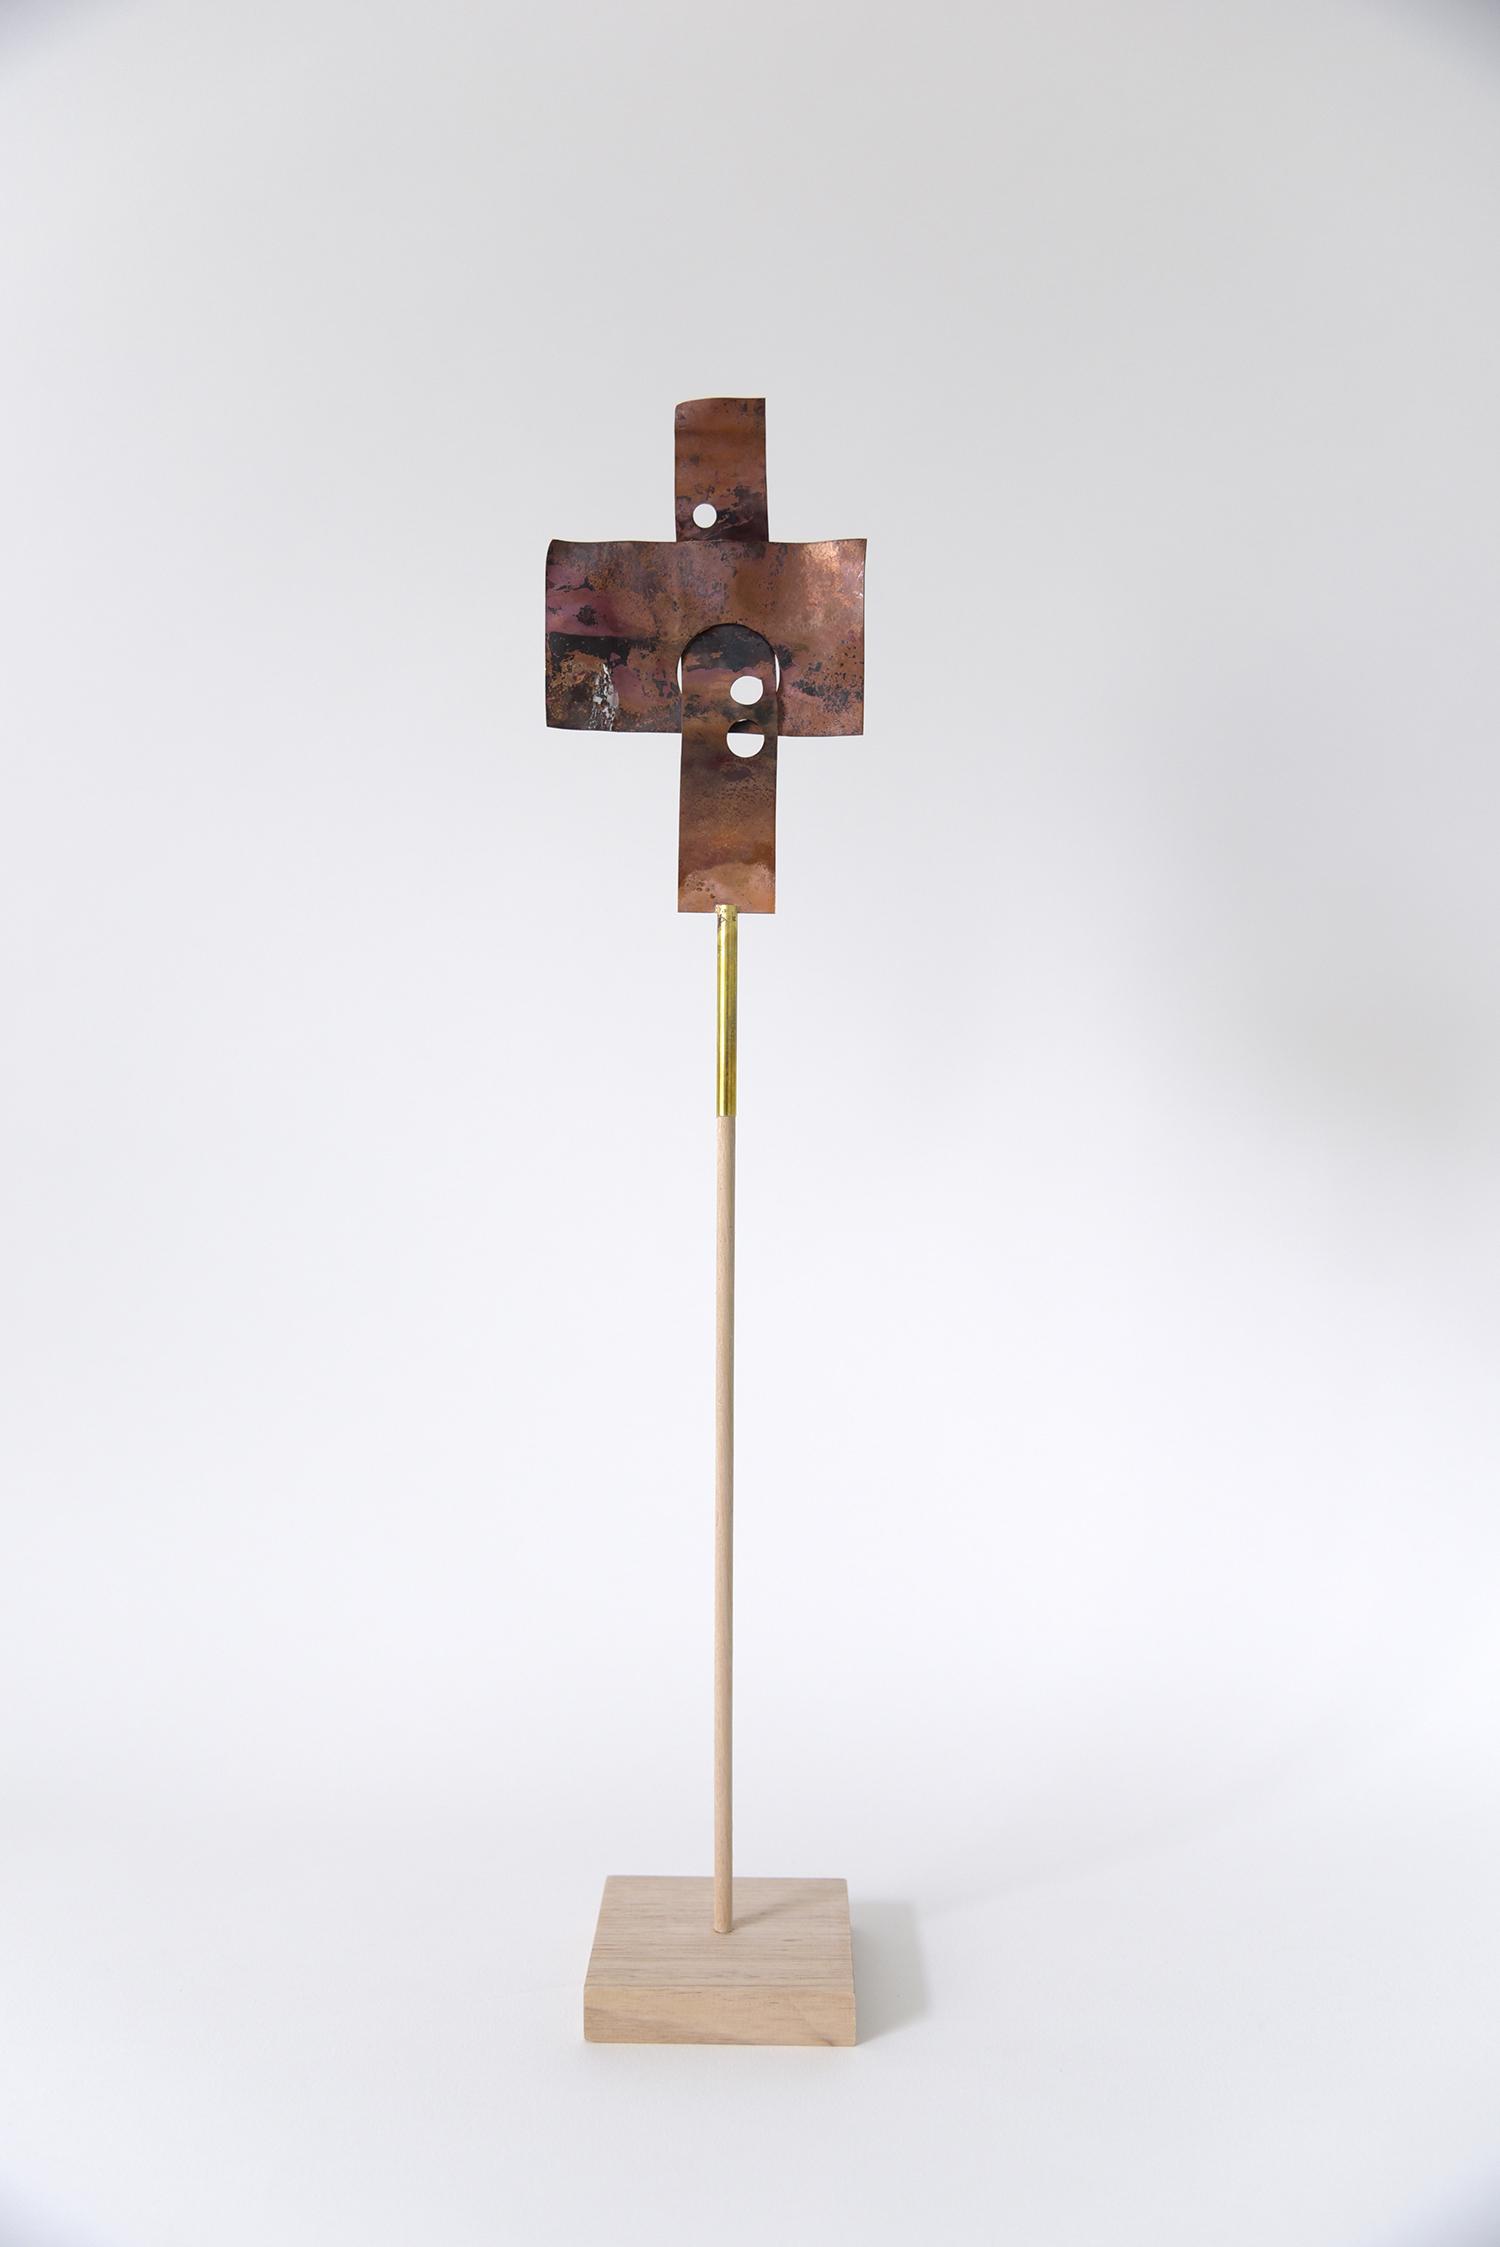 Hardbody Sculpture (Object) XIII